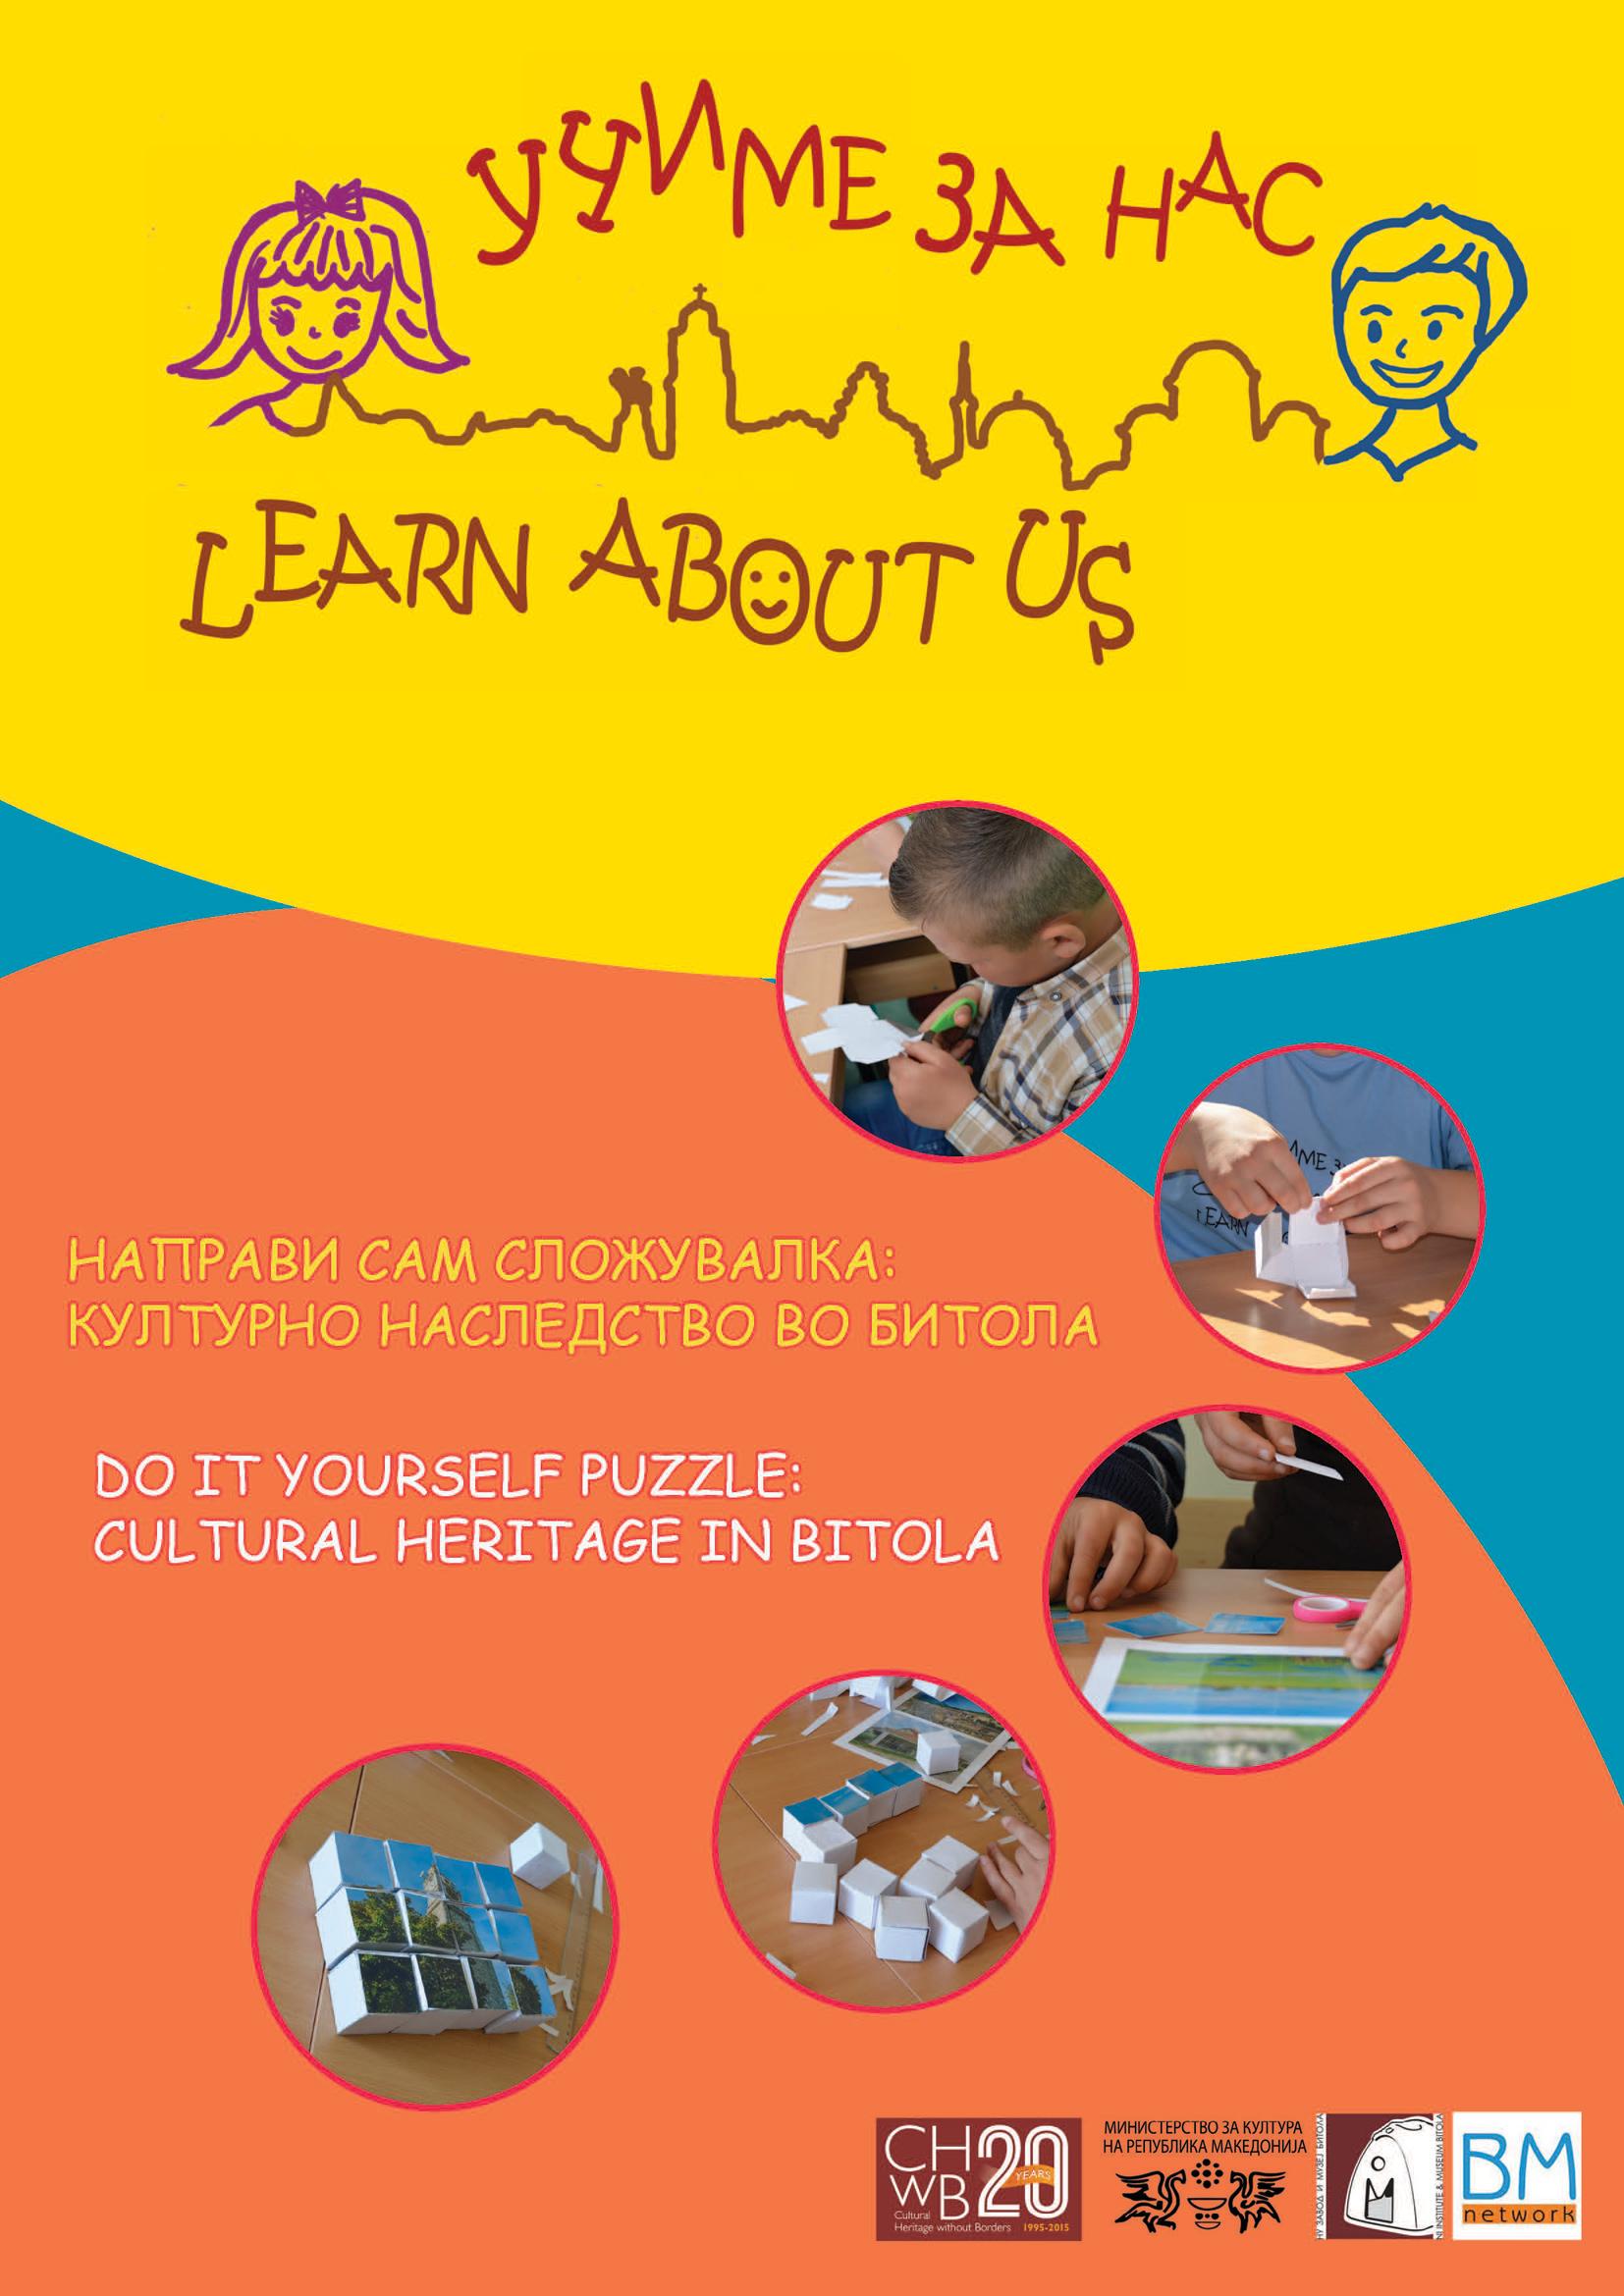 Културно наследство во Битола – сложувалка за деца